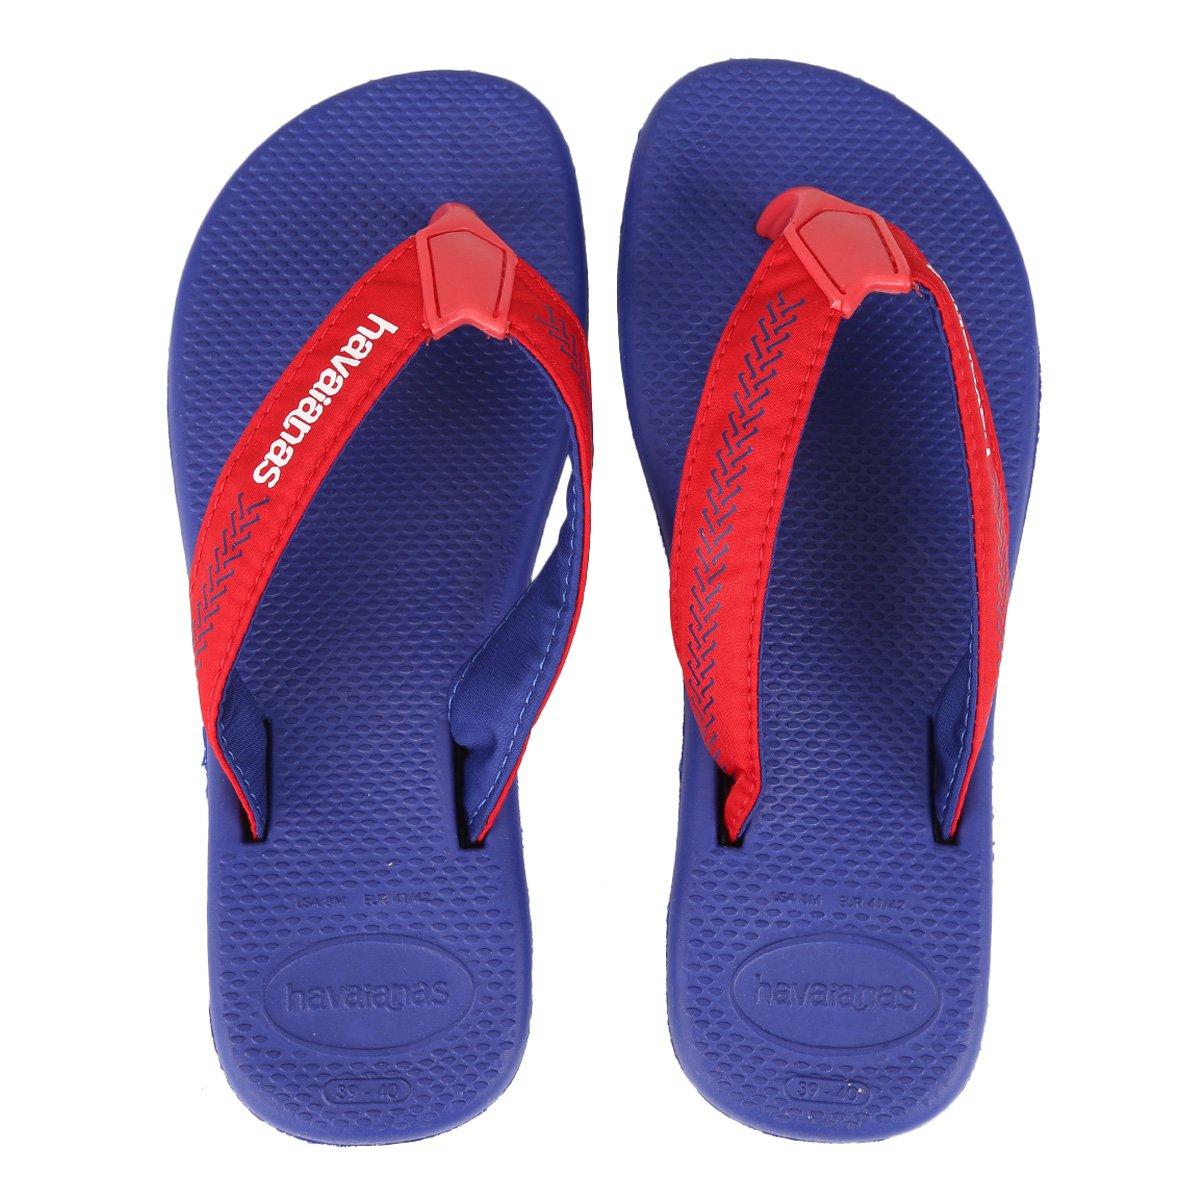 1721d84a75f0ba Chinelo Havaianas Surf Pro Masculino - Azul - Compre Agora